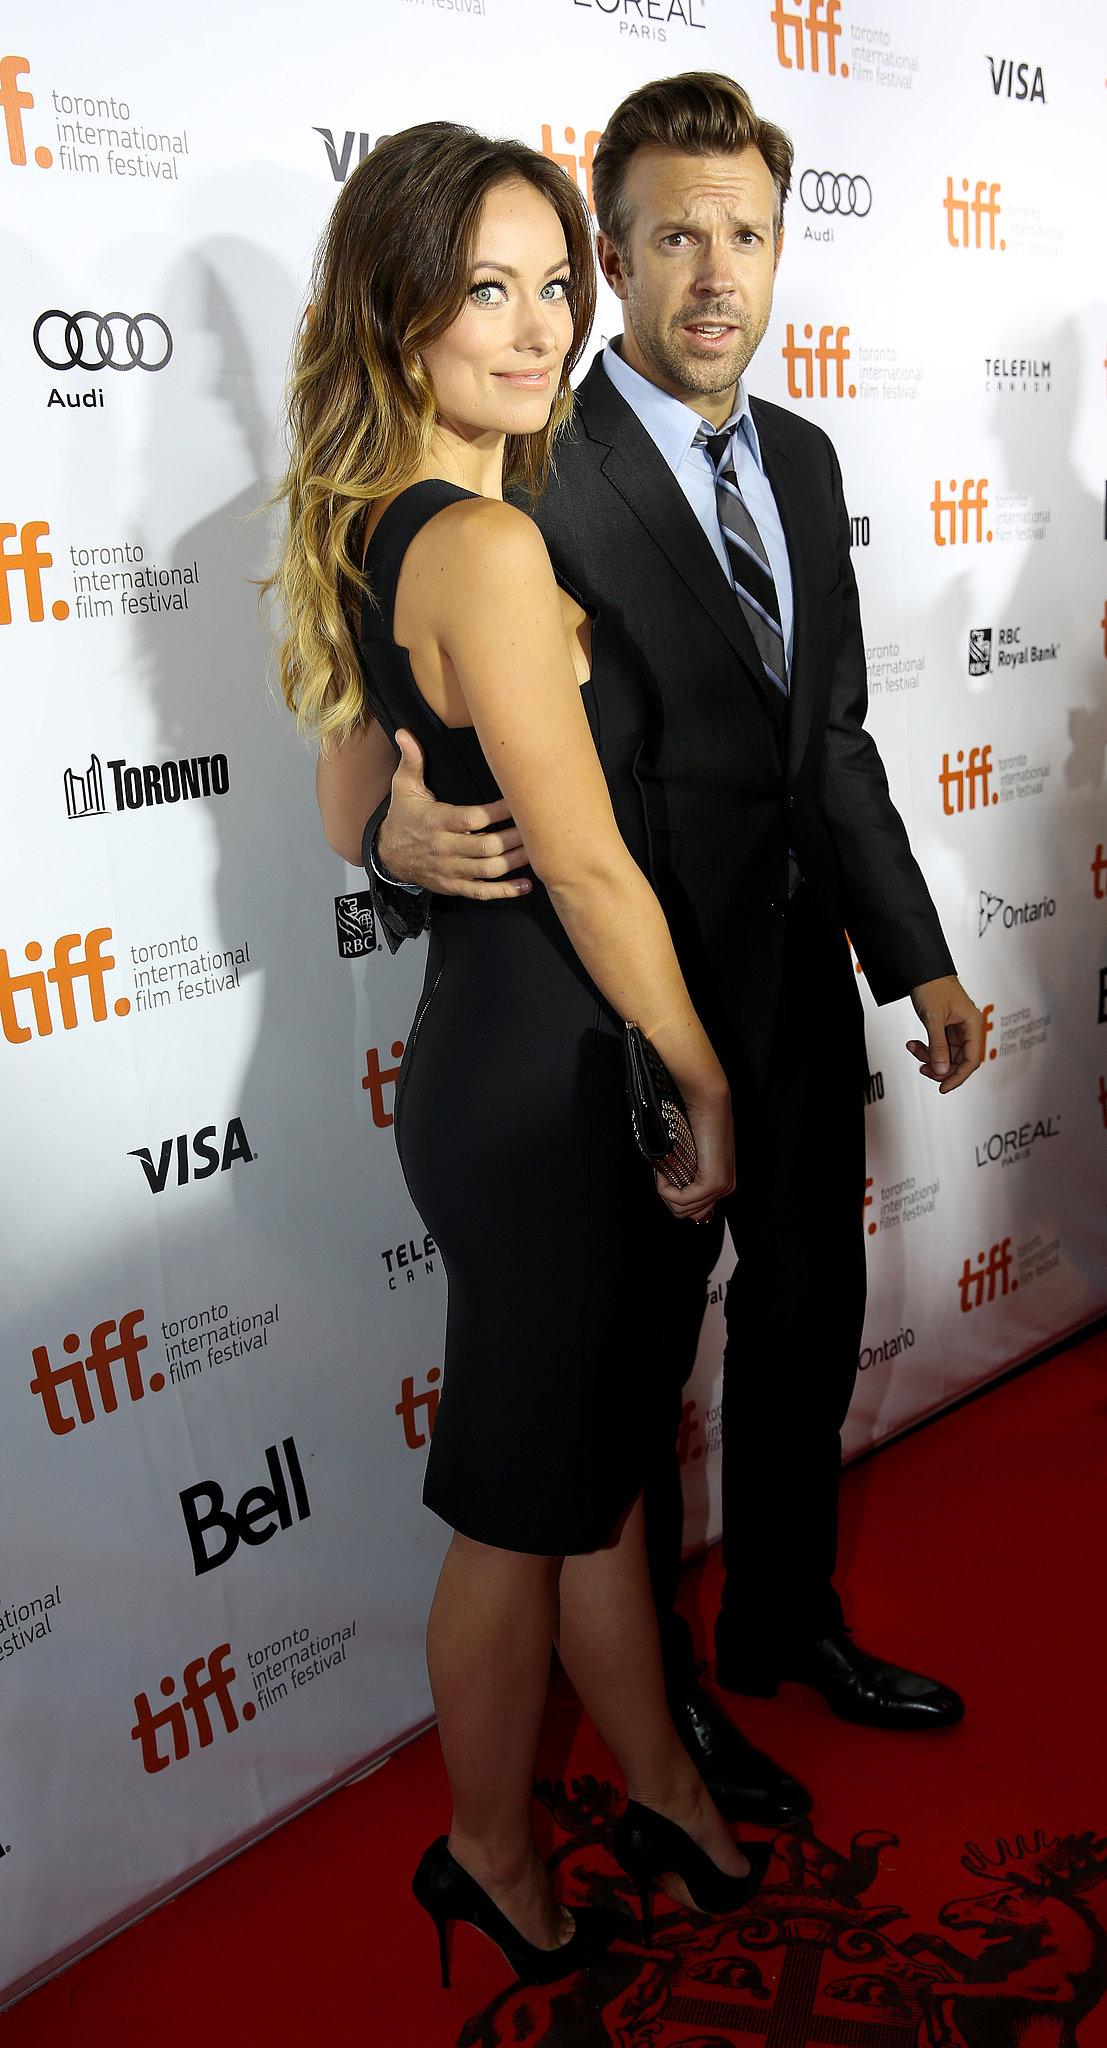 Jason Sudeikis escorted Olivia Wilde on the red carpet.